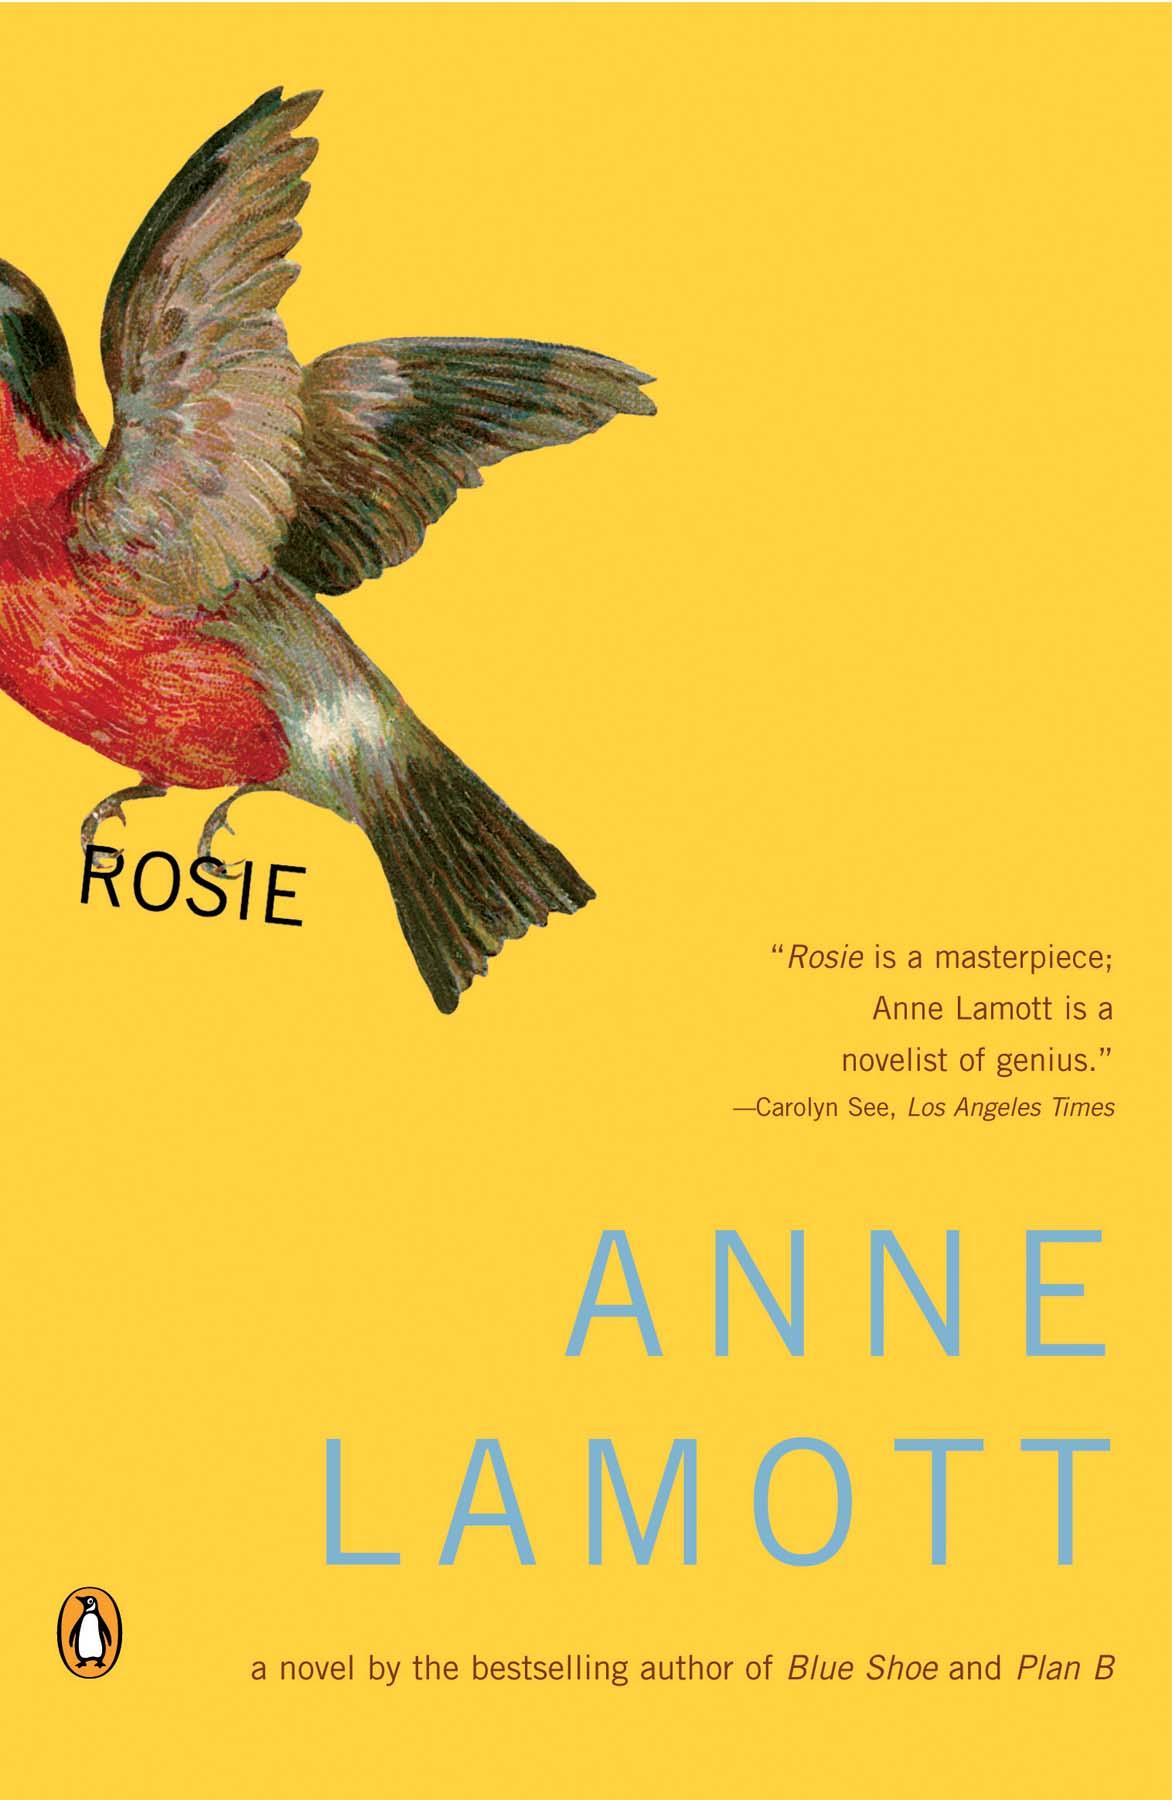 RosieBy ANNE LAMOTT